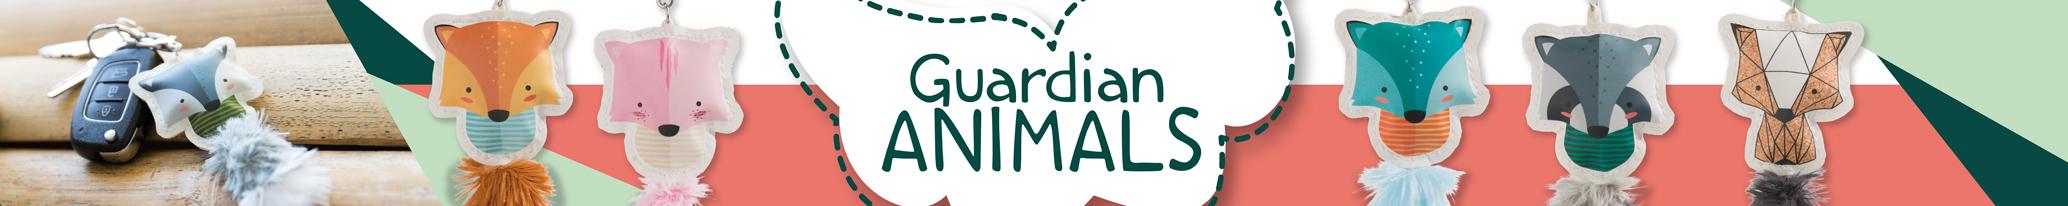 Guardian Animals